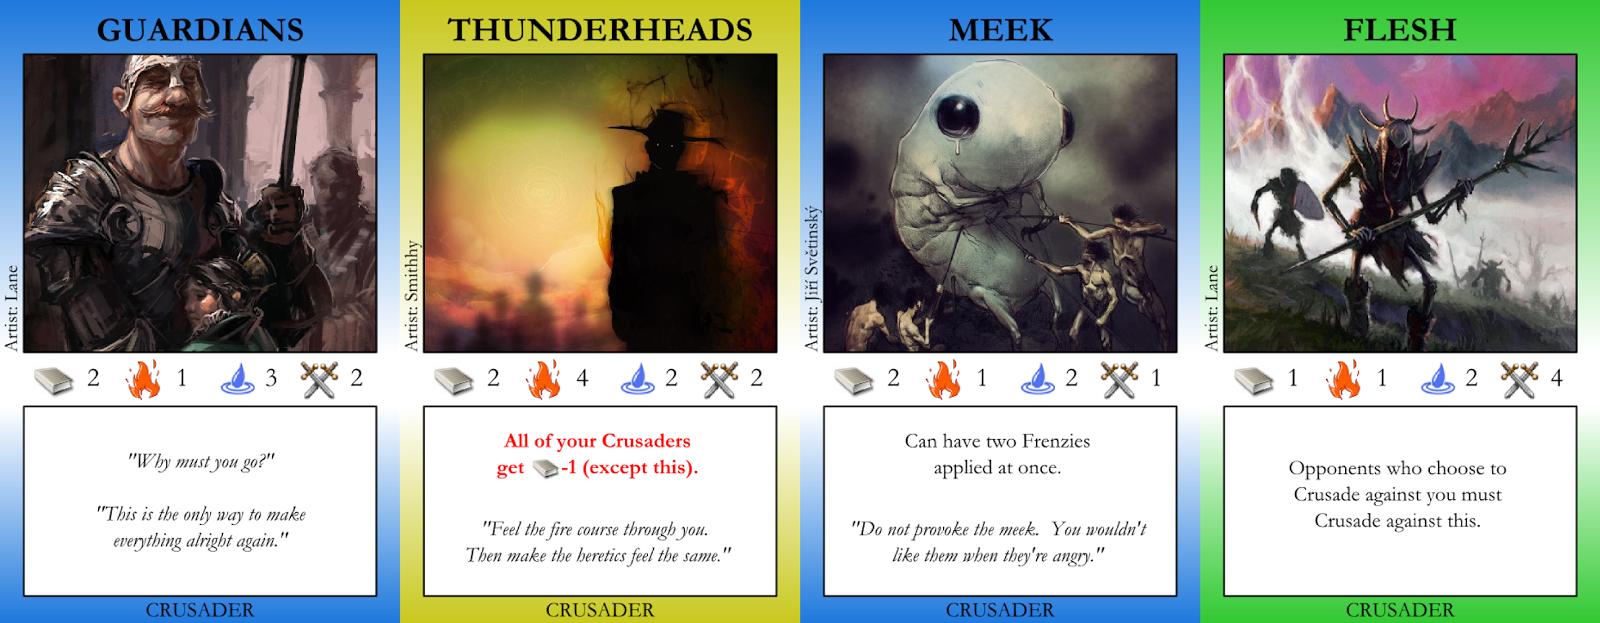 Guardians, Thunderheads, Meek, Flesh